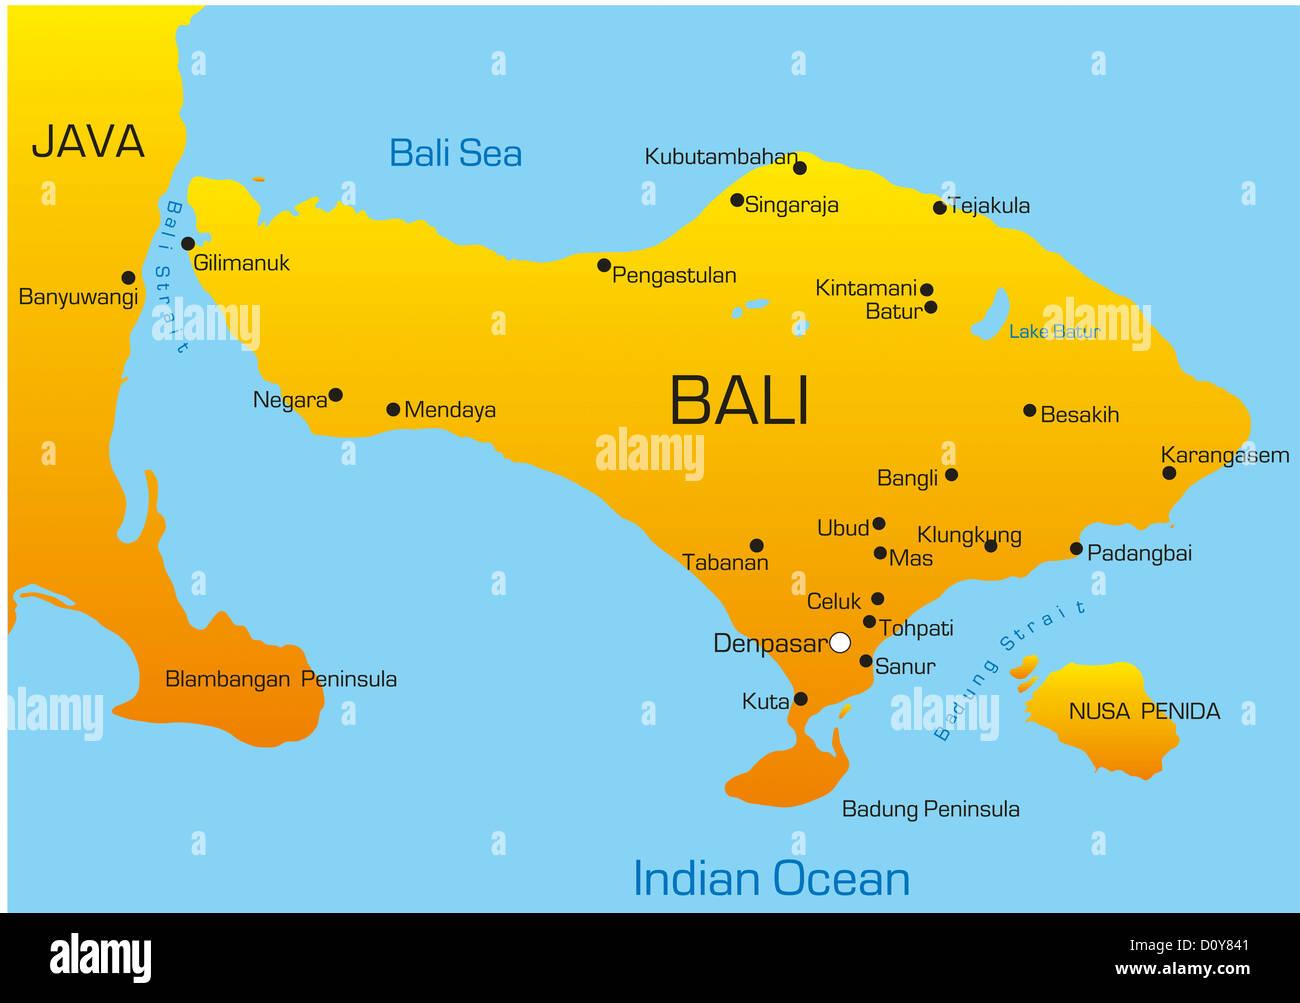 Bali Map Stockfotos & Bali Map Bilder - Seite 3 - Alamy